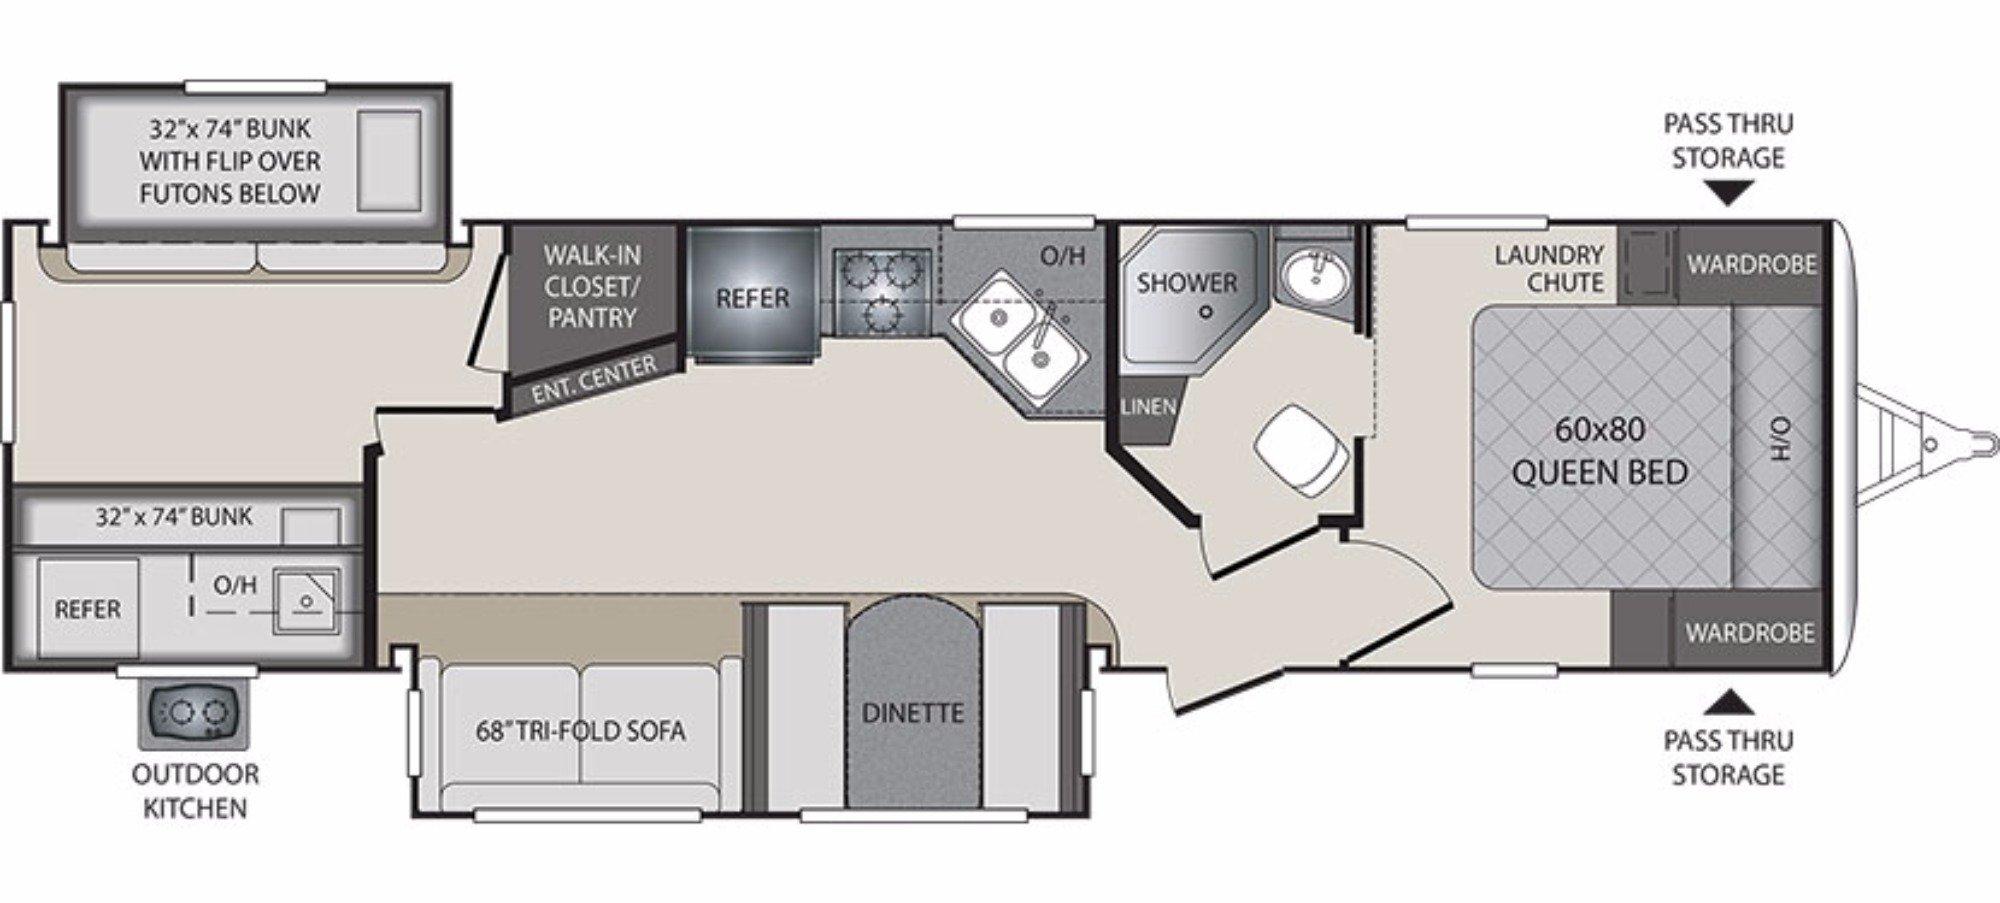 View Floor Plan for 2018 KEYSTONE PREMIER 31BK